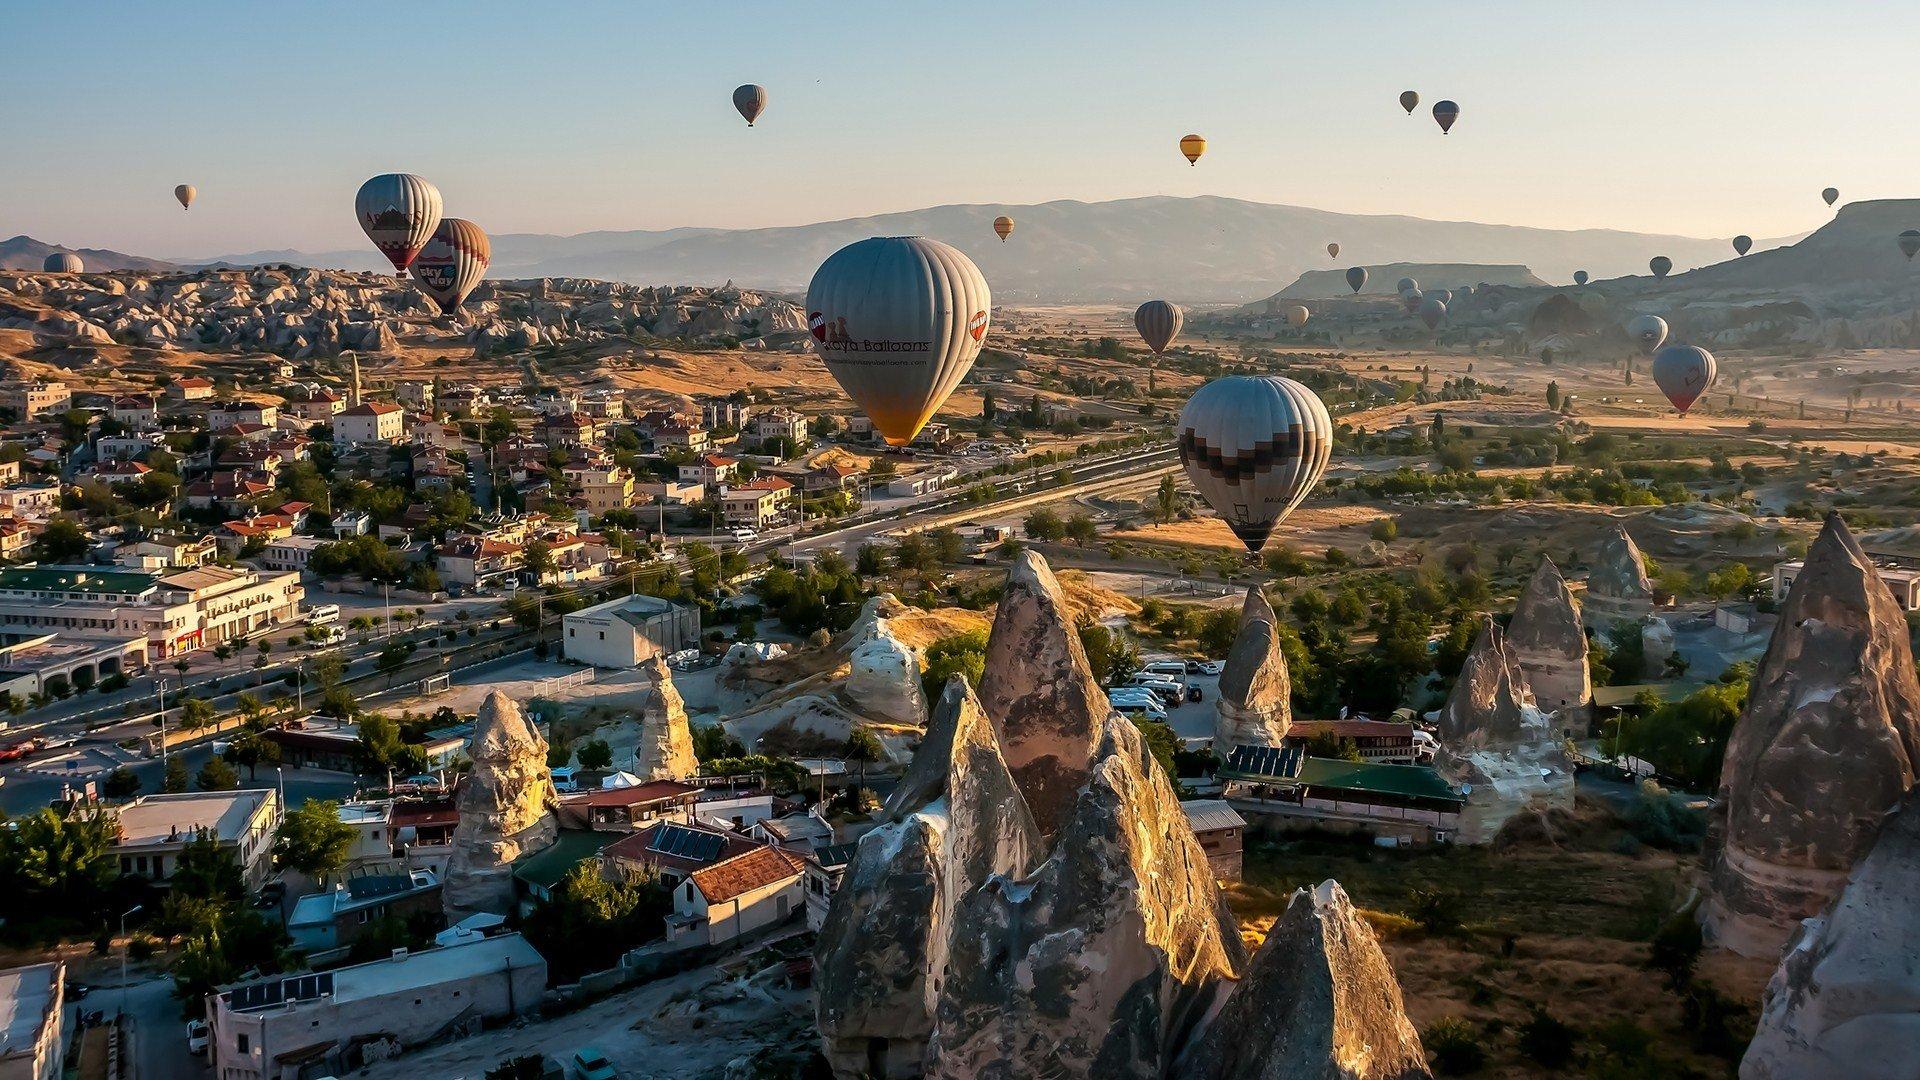 Vehicles - Hot Air Balloon  Wallpaper